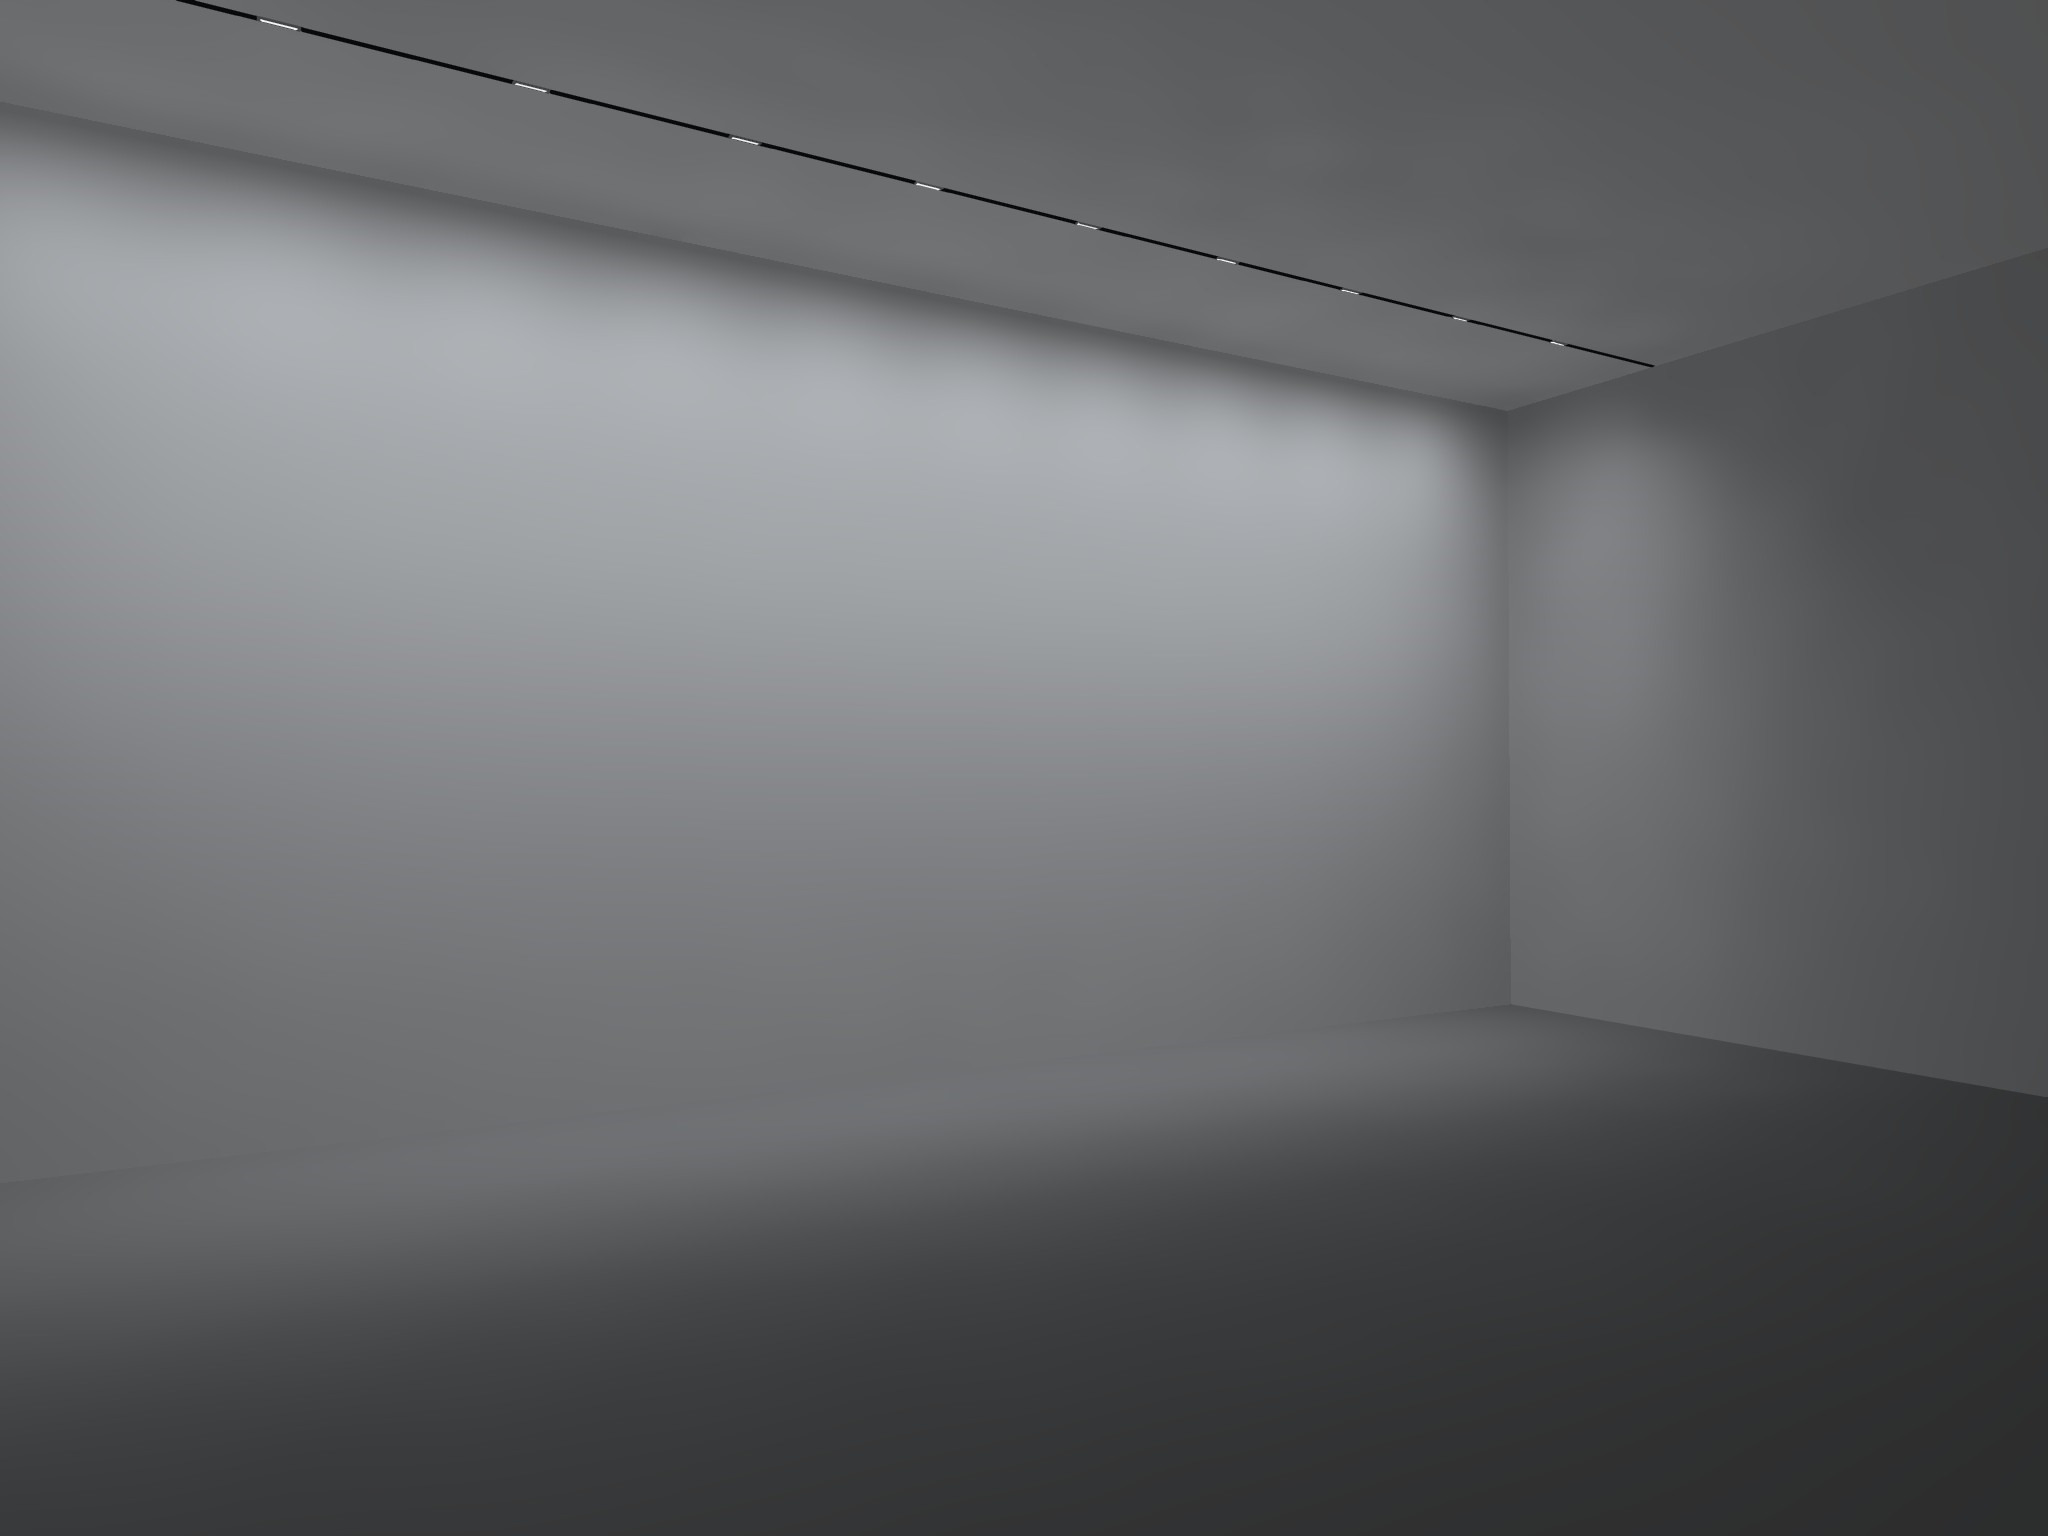 Linear Laser Blade Wall Wash 2.jpg